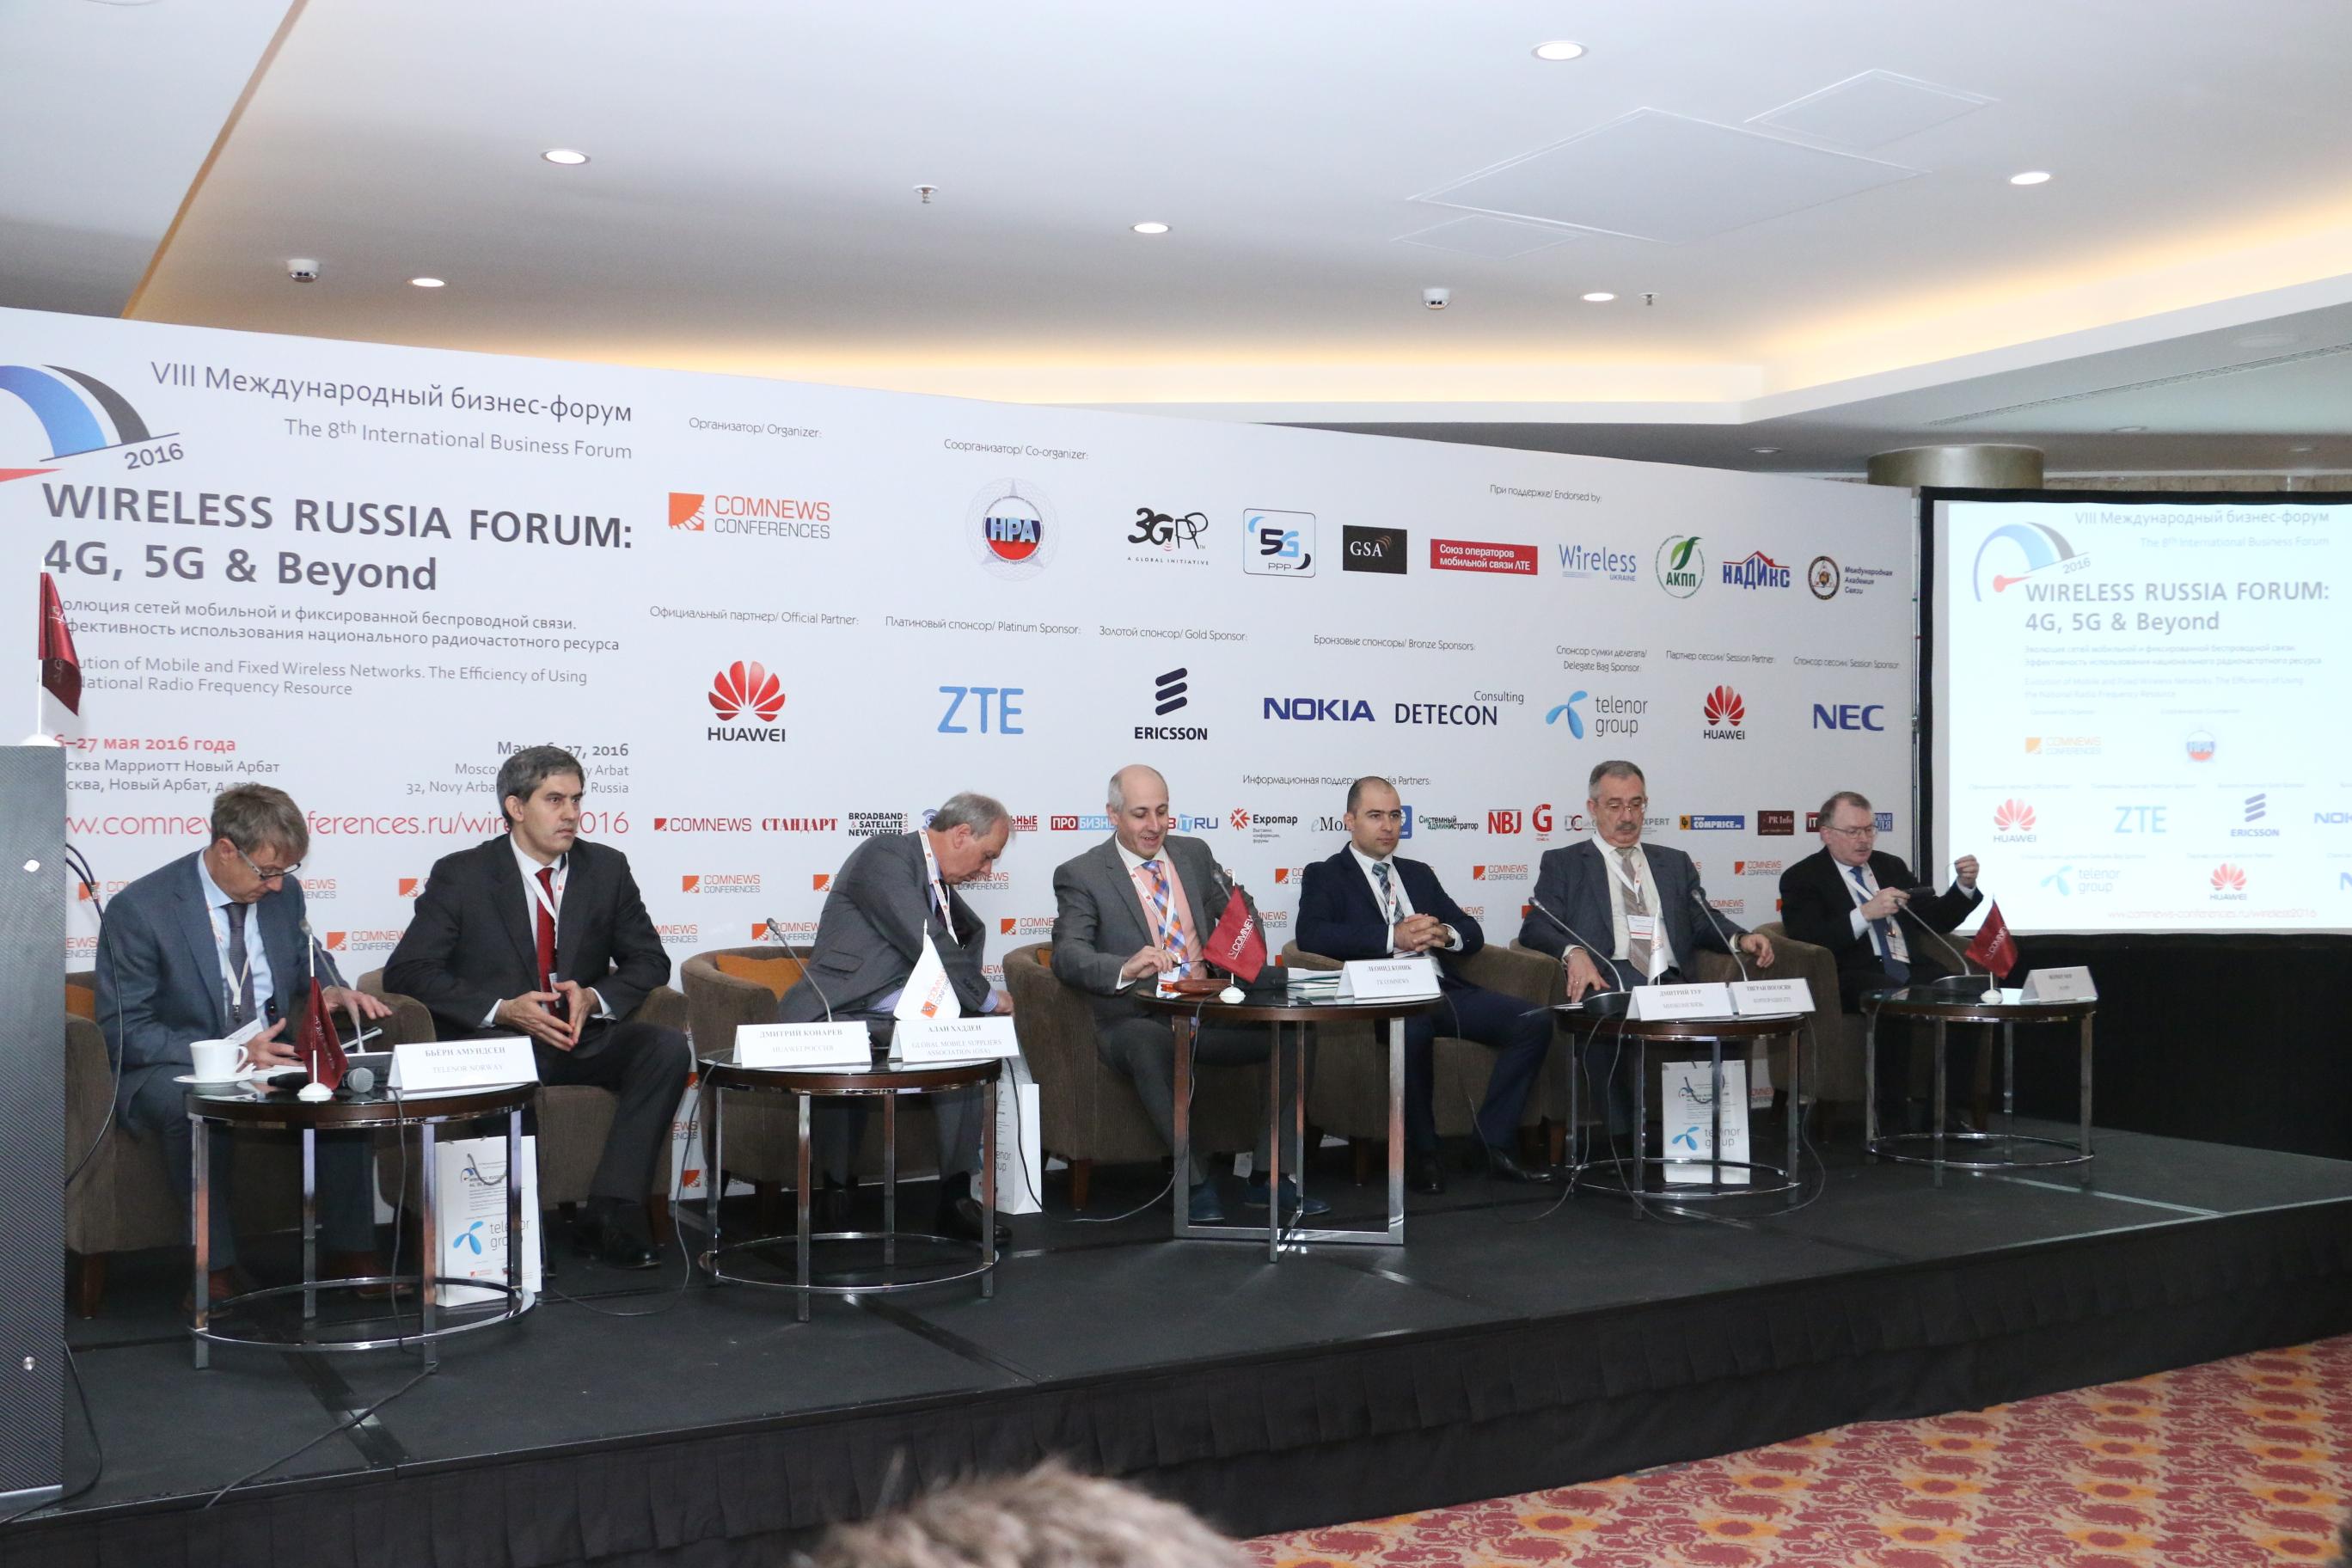 X Международный бизнес-форум Wireless Russia & CIS Forum: LTE, 5G & Beyond